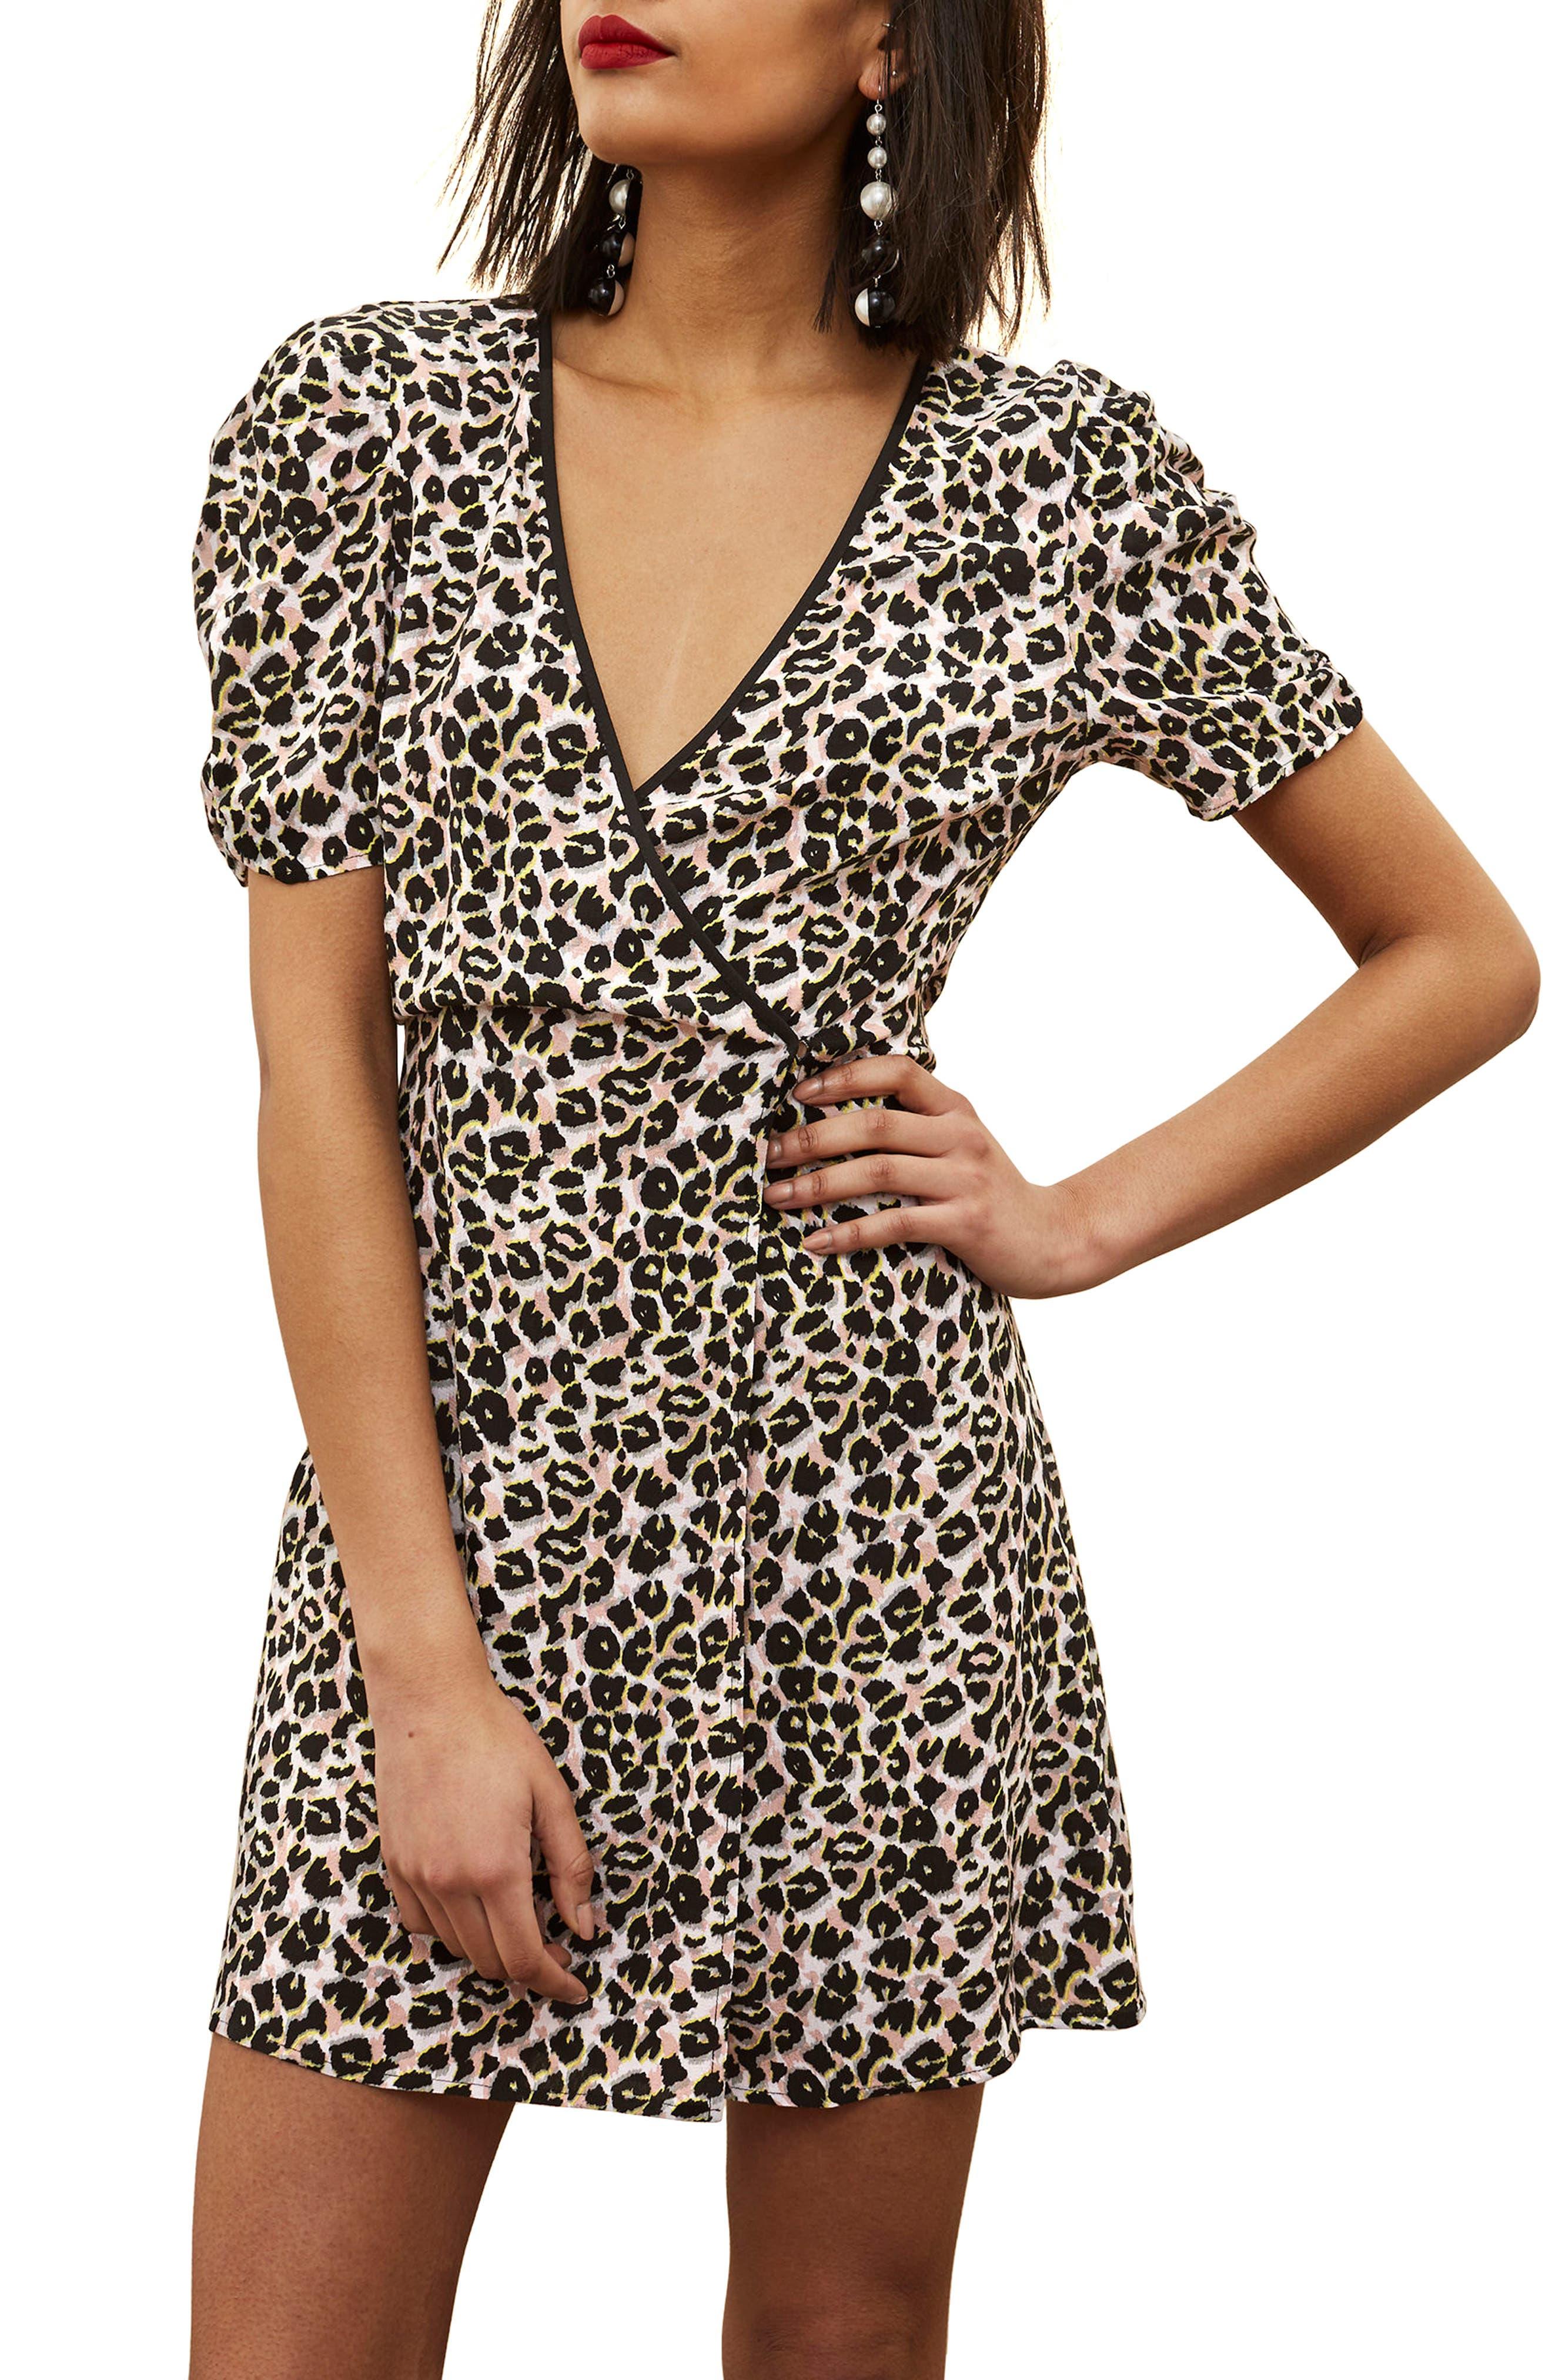 Leopard Wrap Minidress,                             Main thumbnail 1, color,                             201